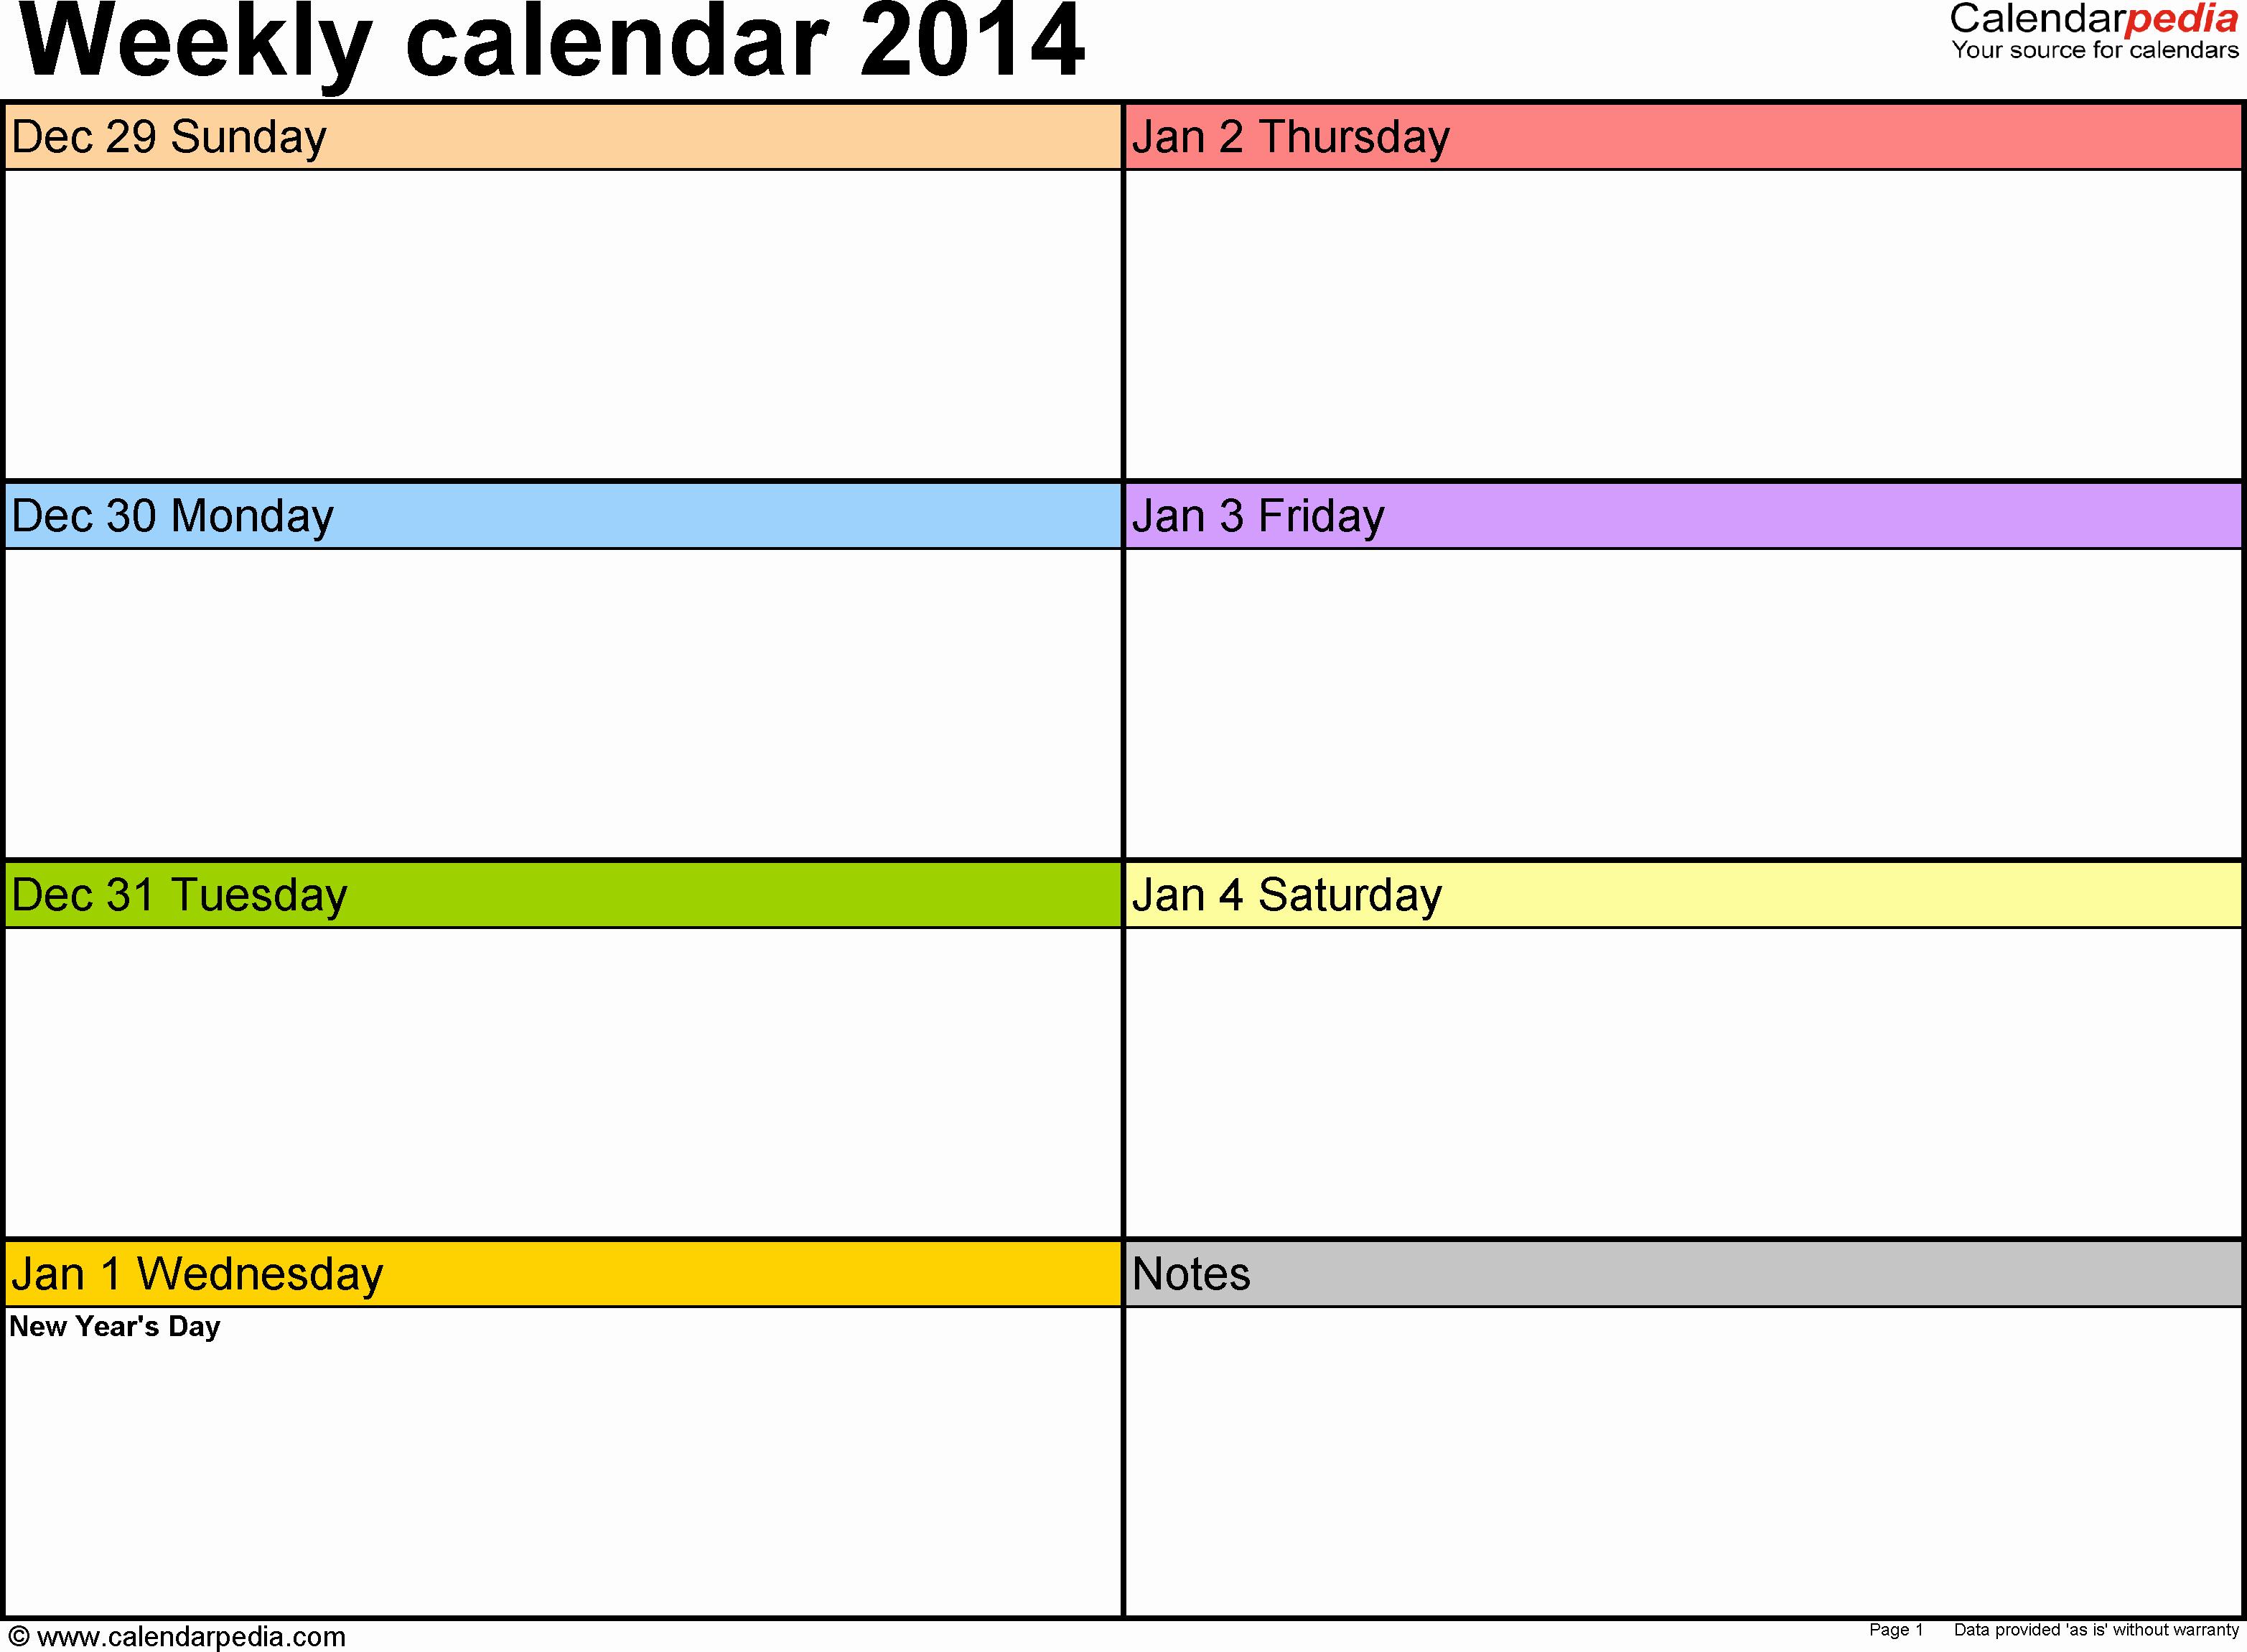 One Week Schedule Template Fresh Weekly Calendar 2014 for Pdf 4 Free Printable Templates